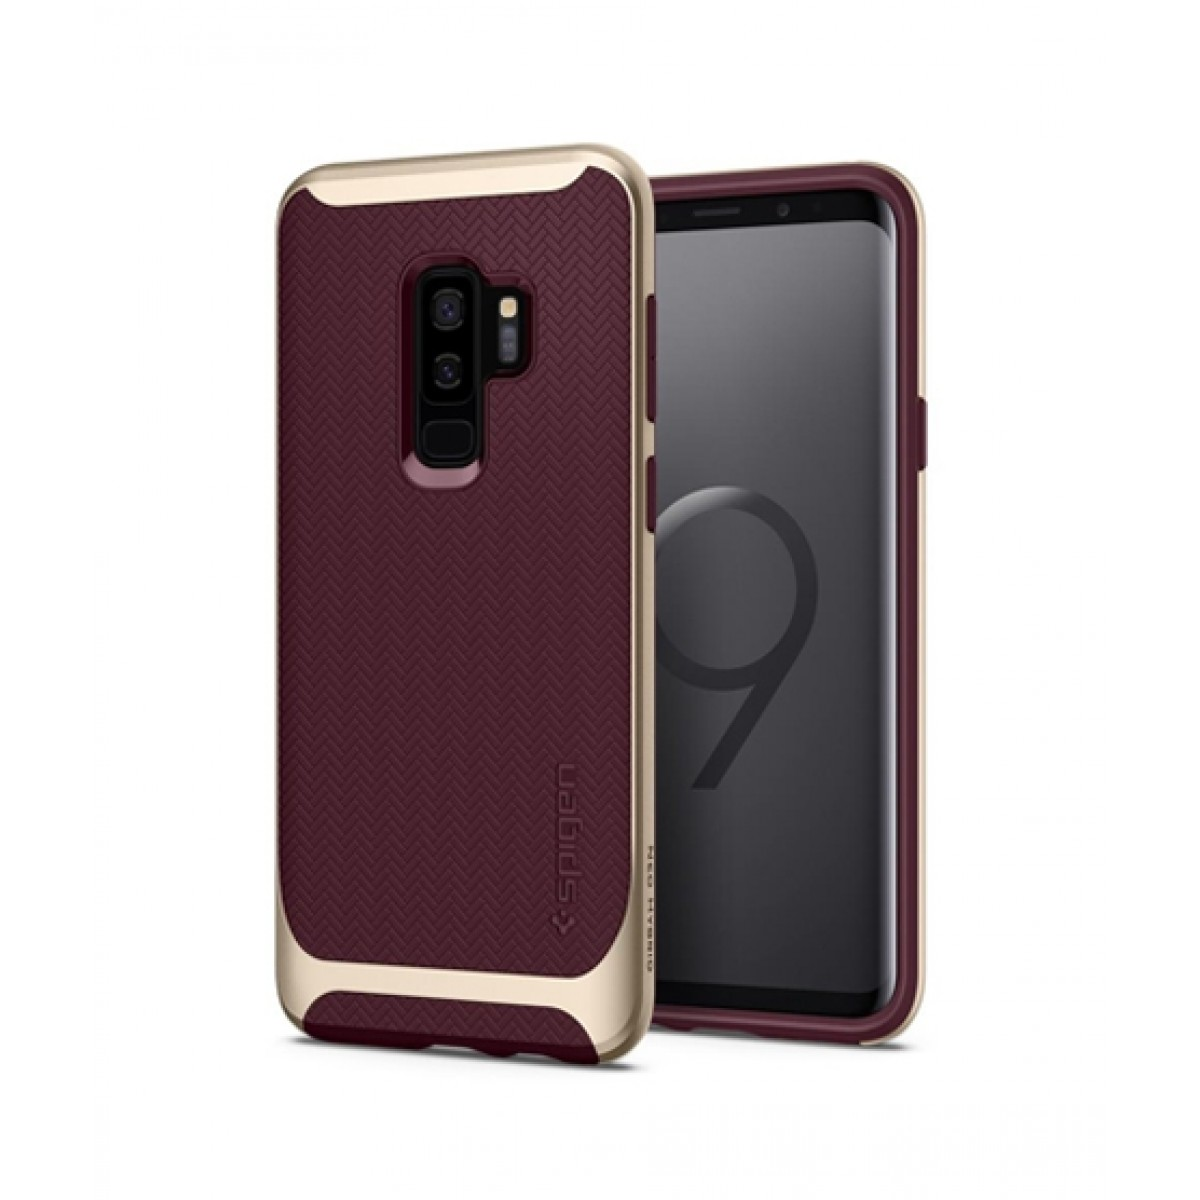 new style 7f8e4 64b1f Spigen Neo Hybrid Burgundy Case For Galaxy S9+